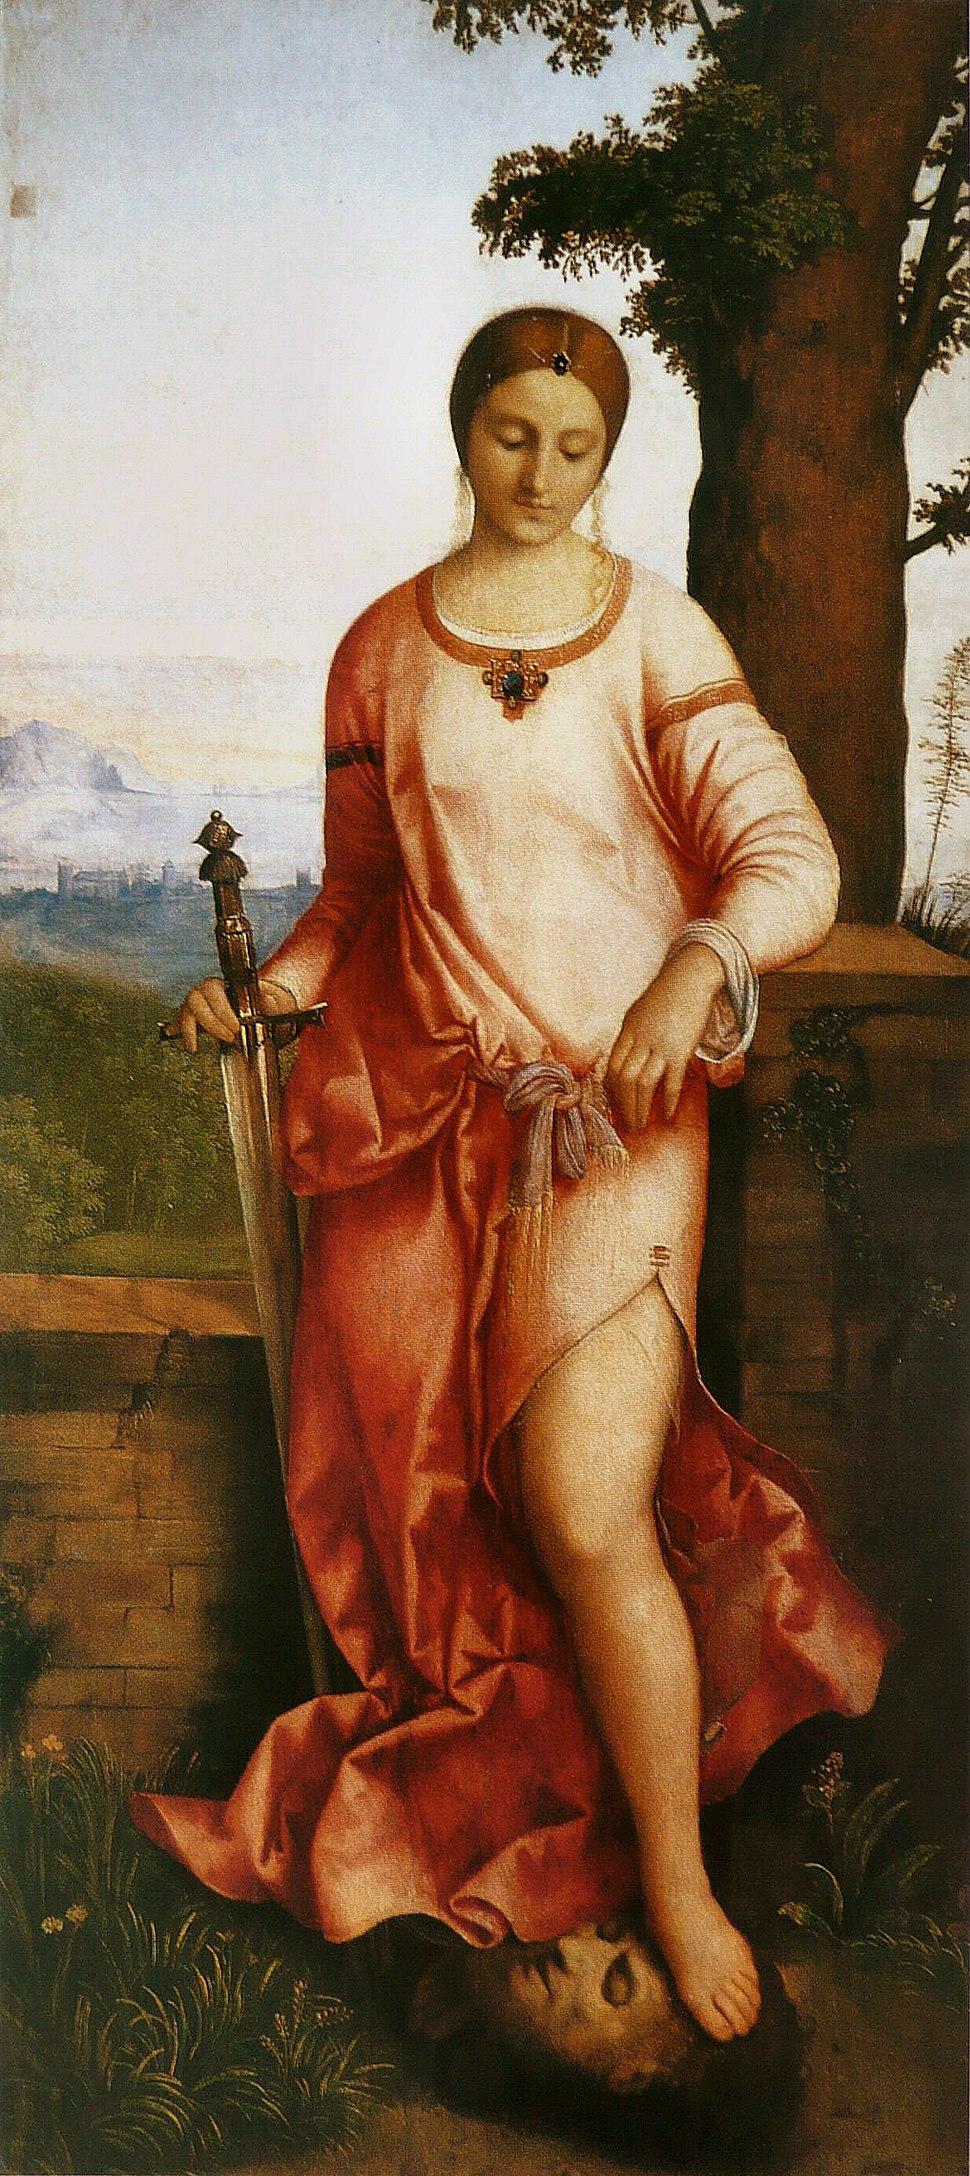 Giorgione - Judith